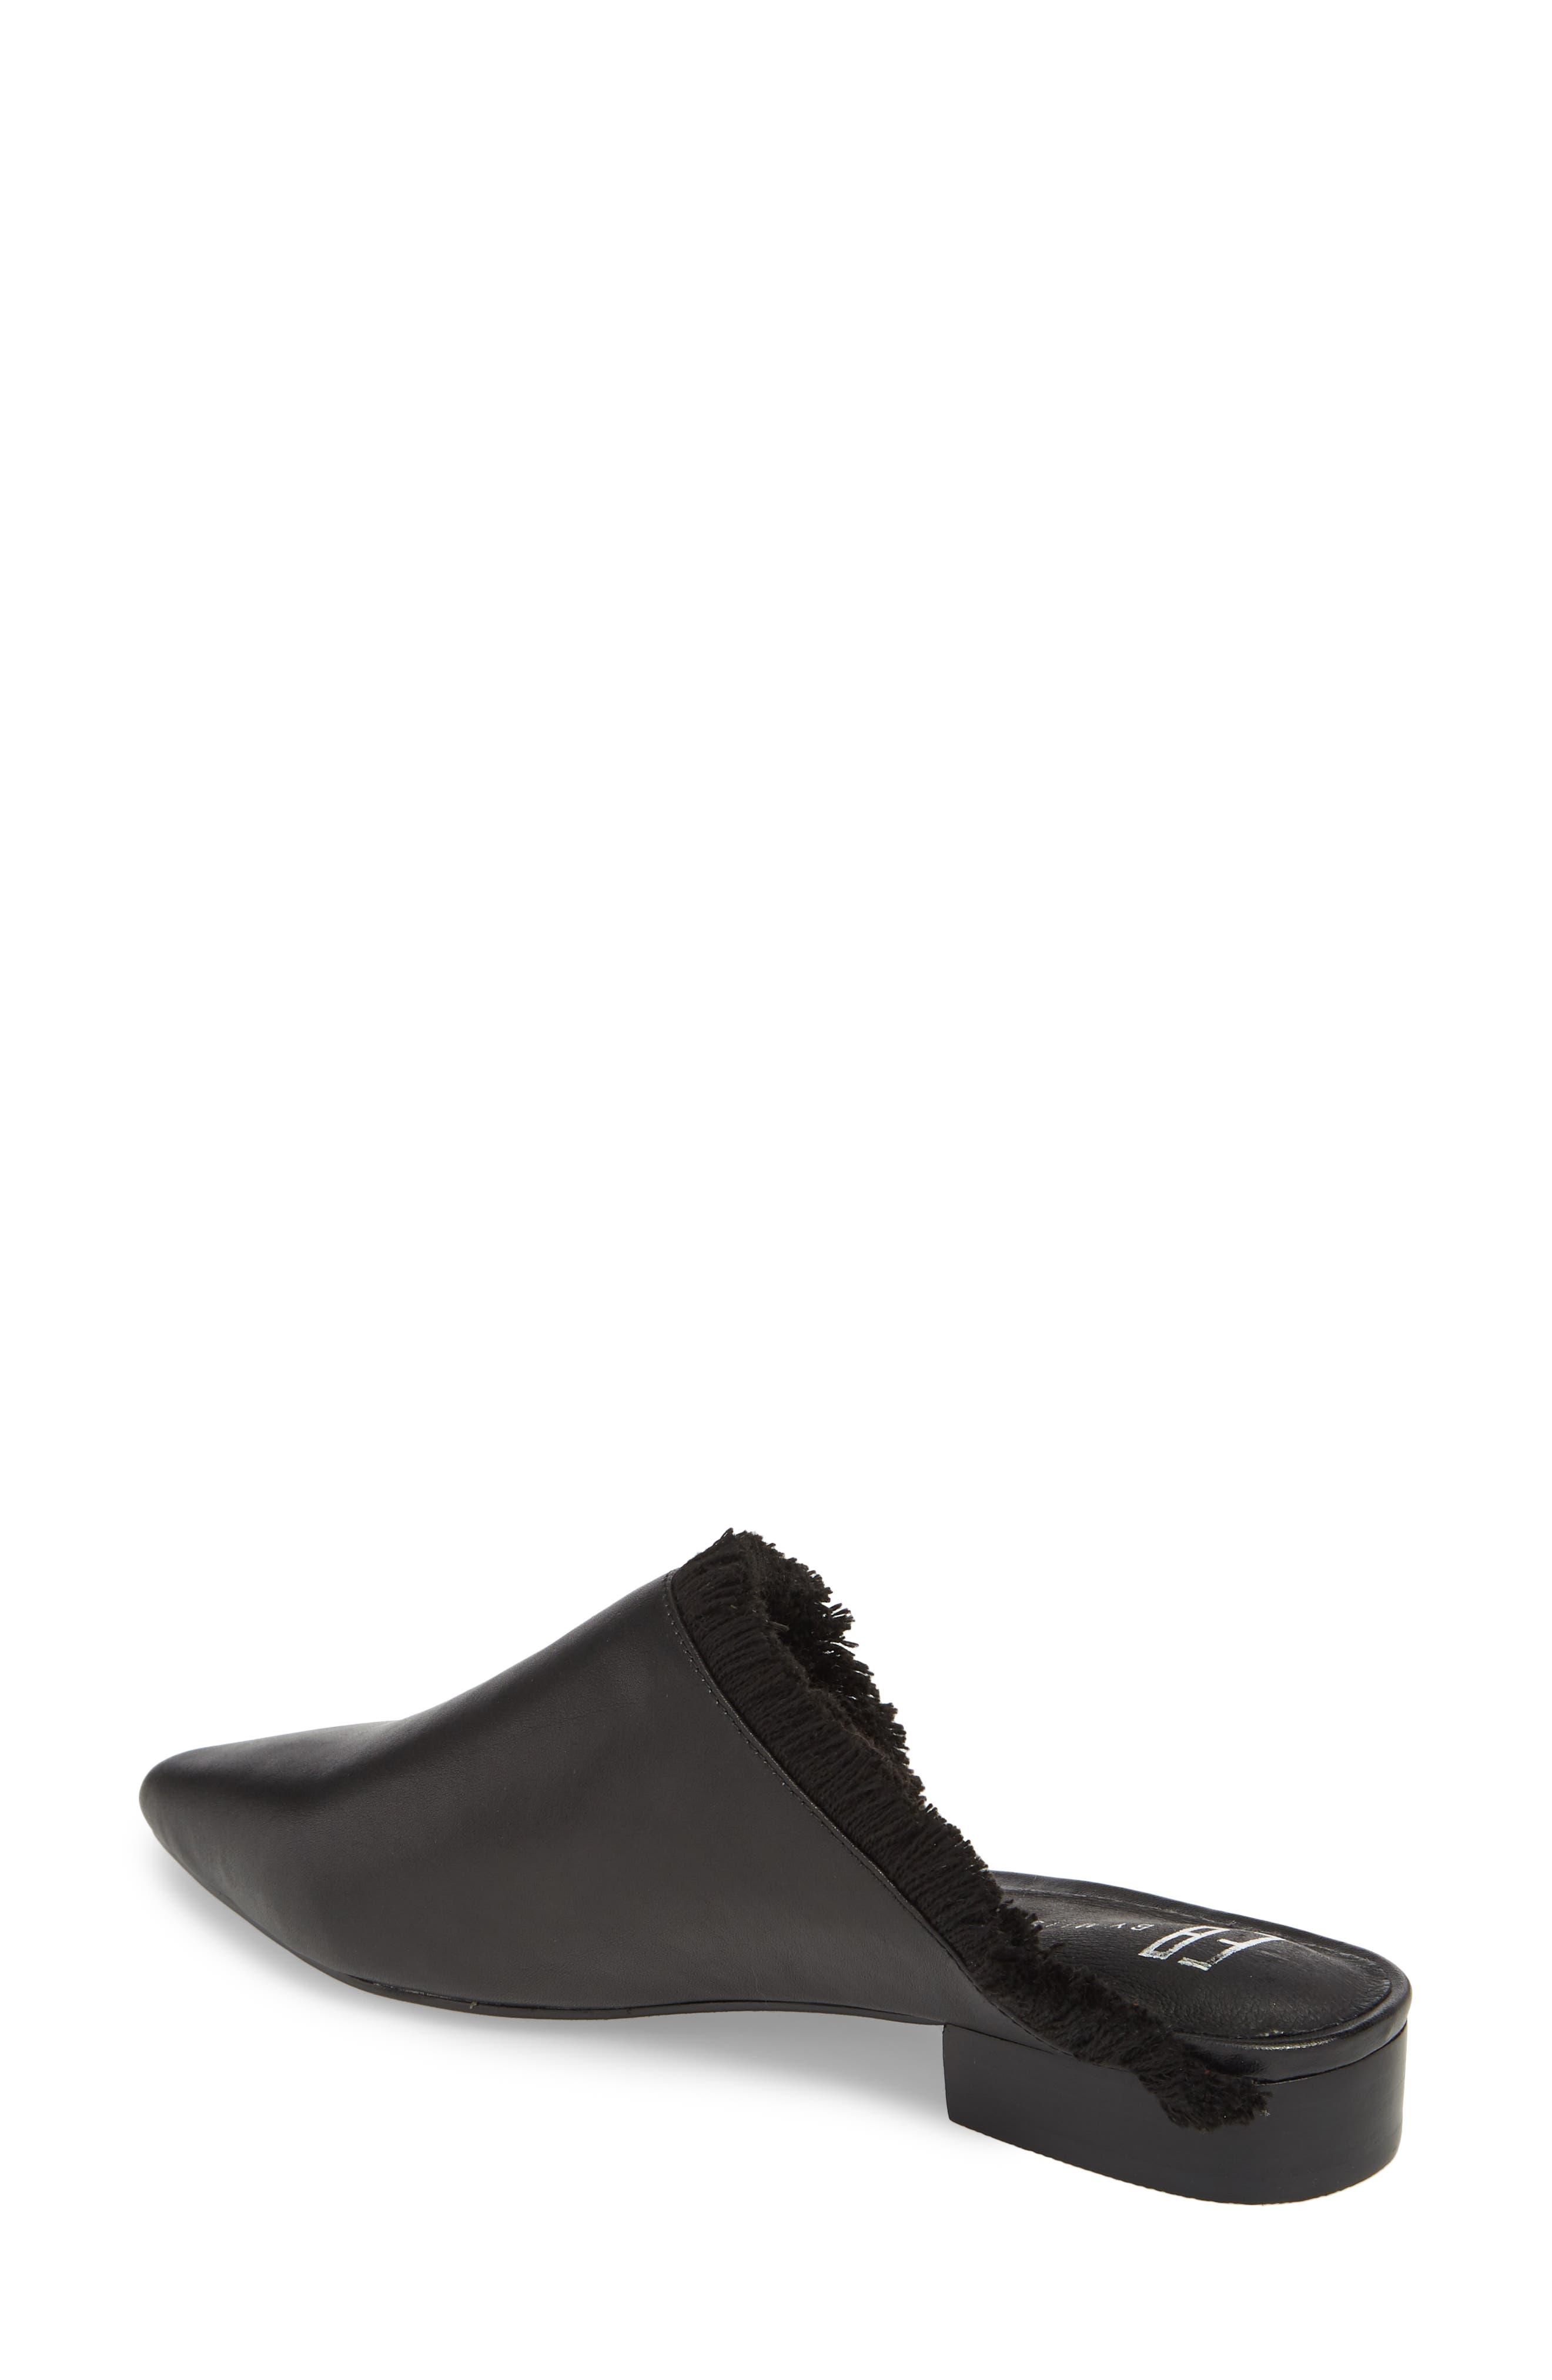 Leroy Asymmetrical Flat Mule,                             Alternate thumbnail 2, color,                             Black Leather